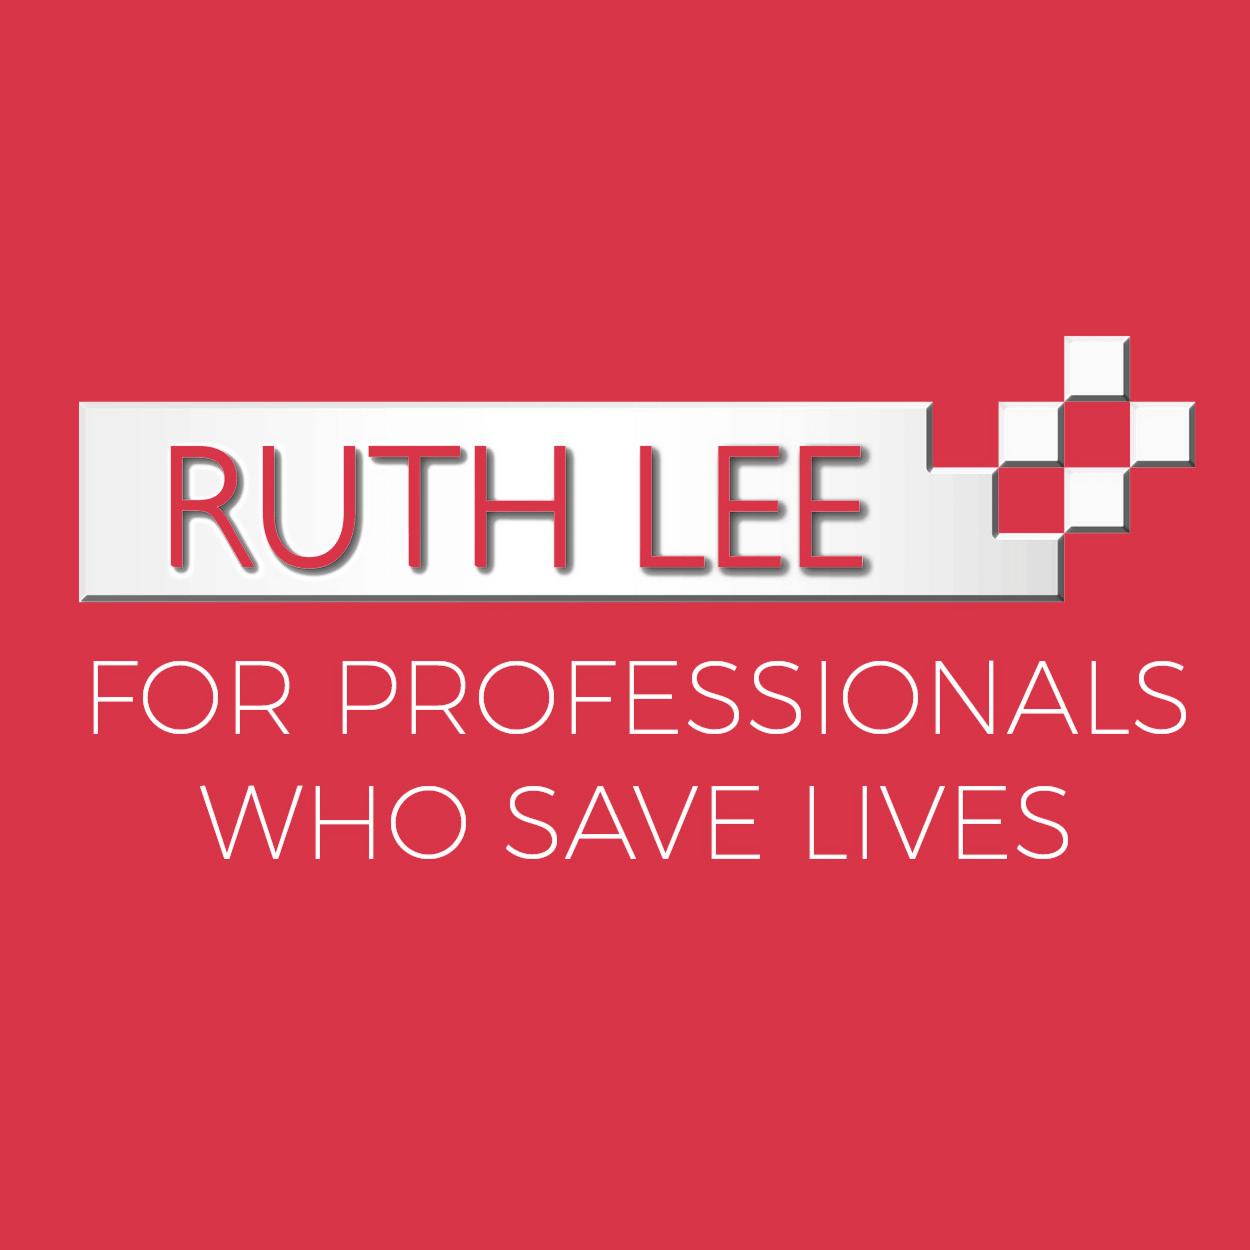 Ruth Lee Ltd